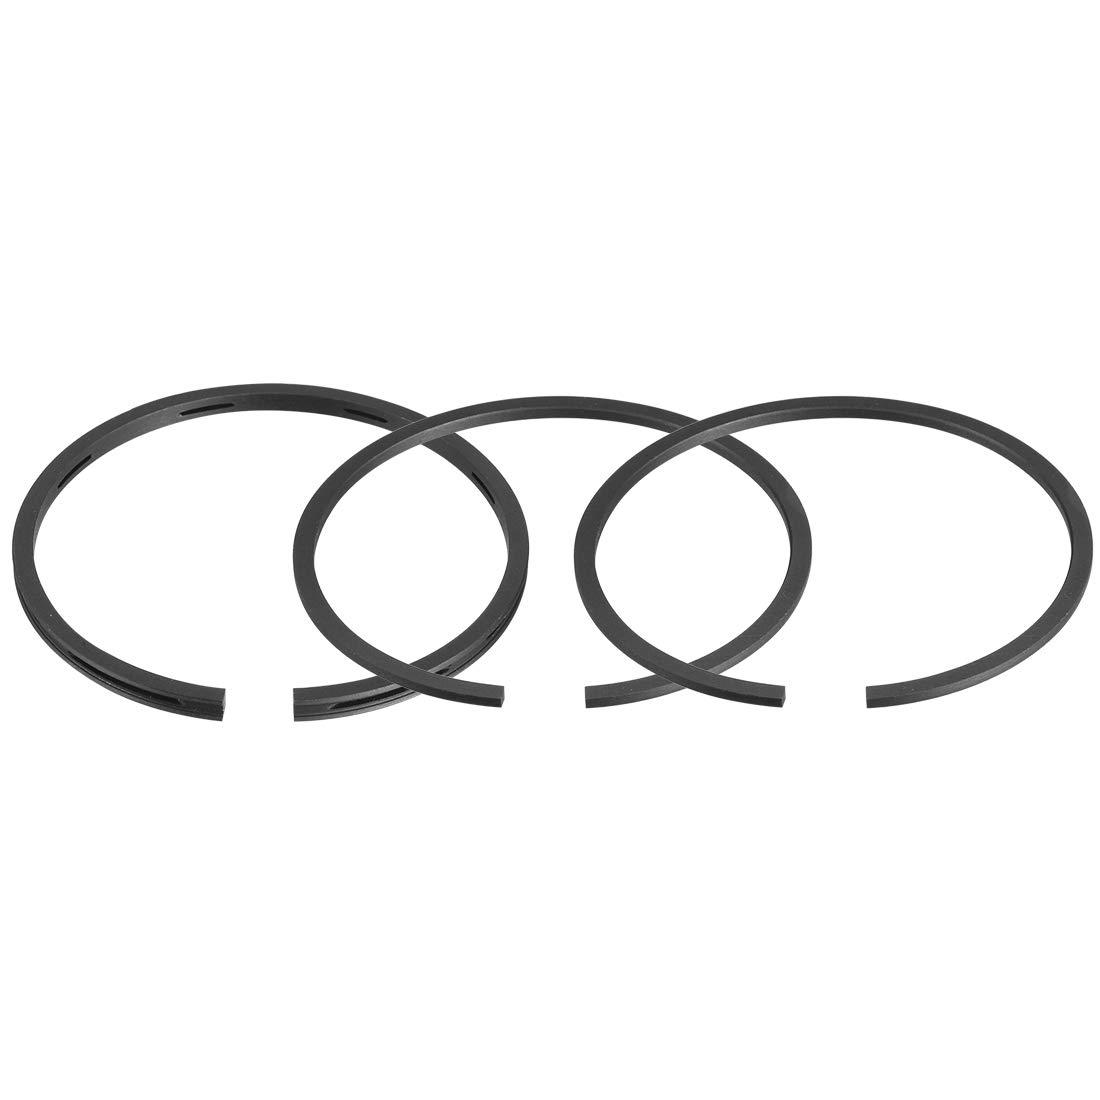 uxcell/® Air Compressor Parts 65mm Diameter Piston Rings 3 Pcs